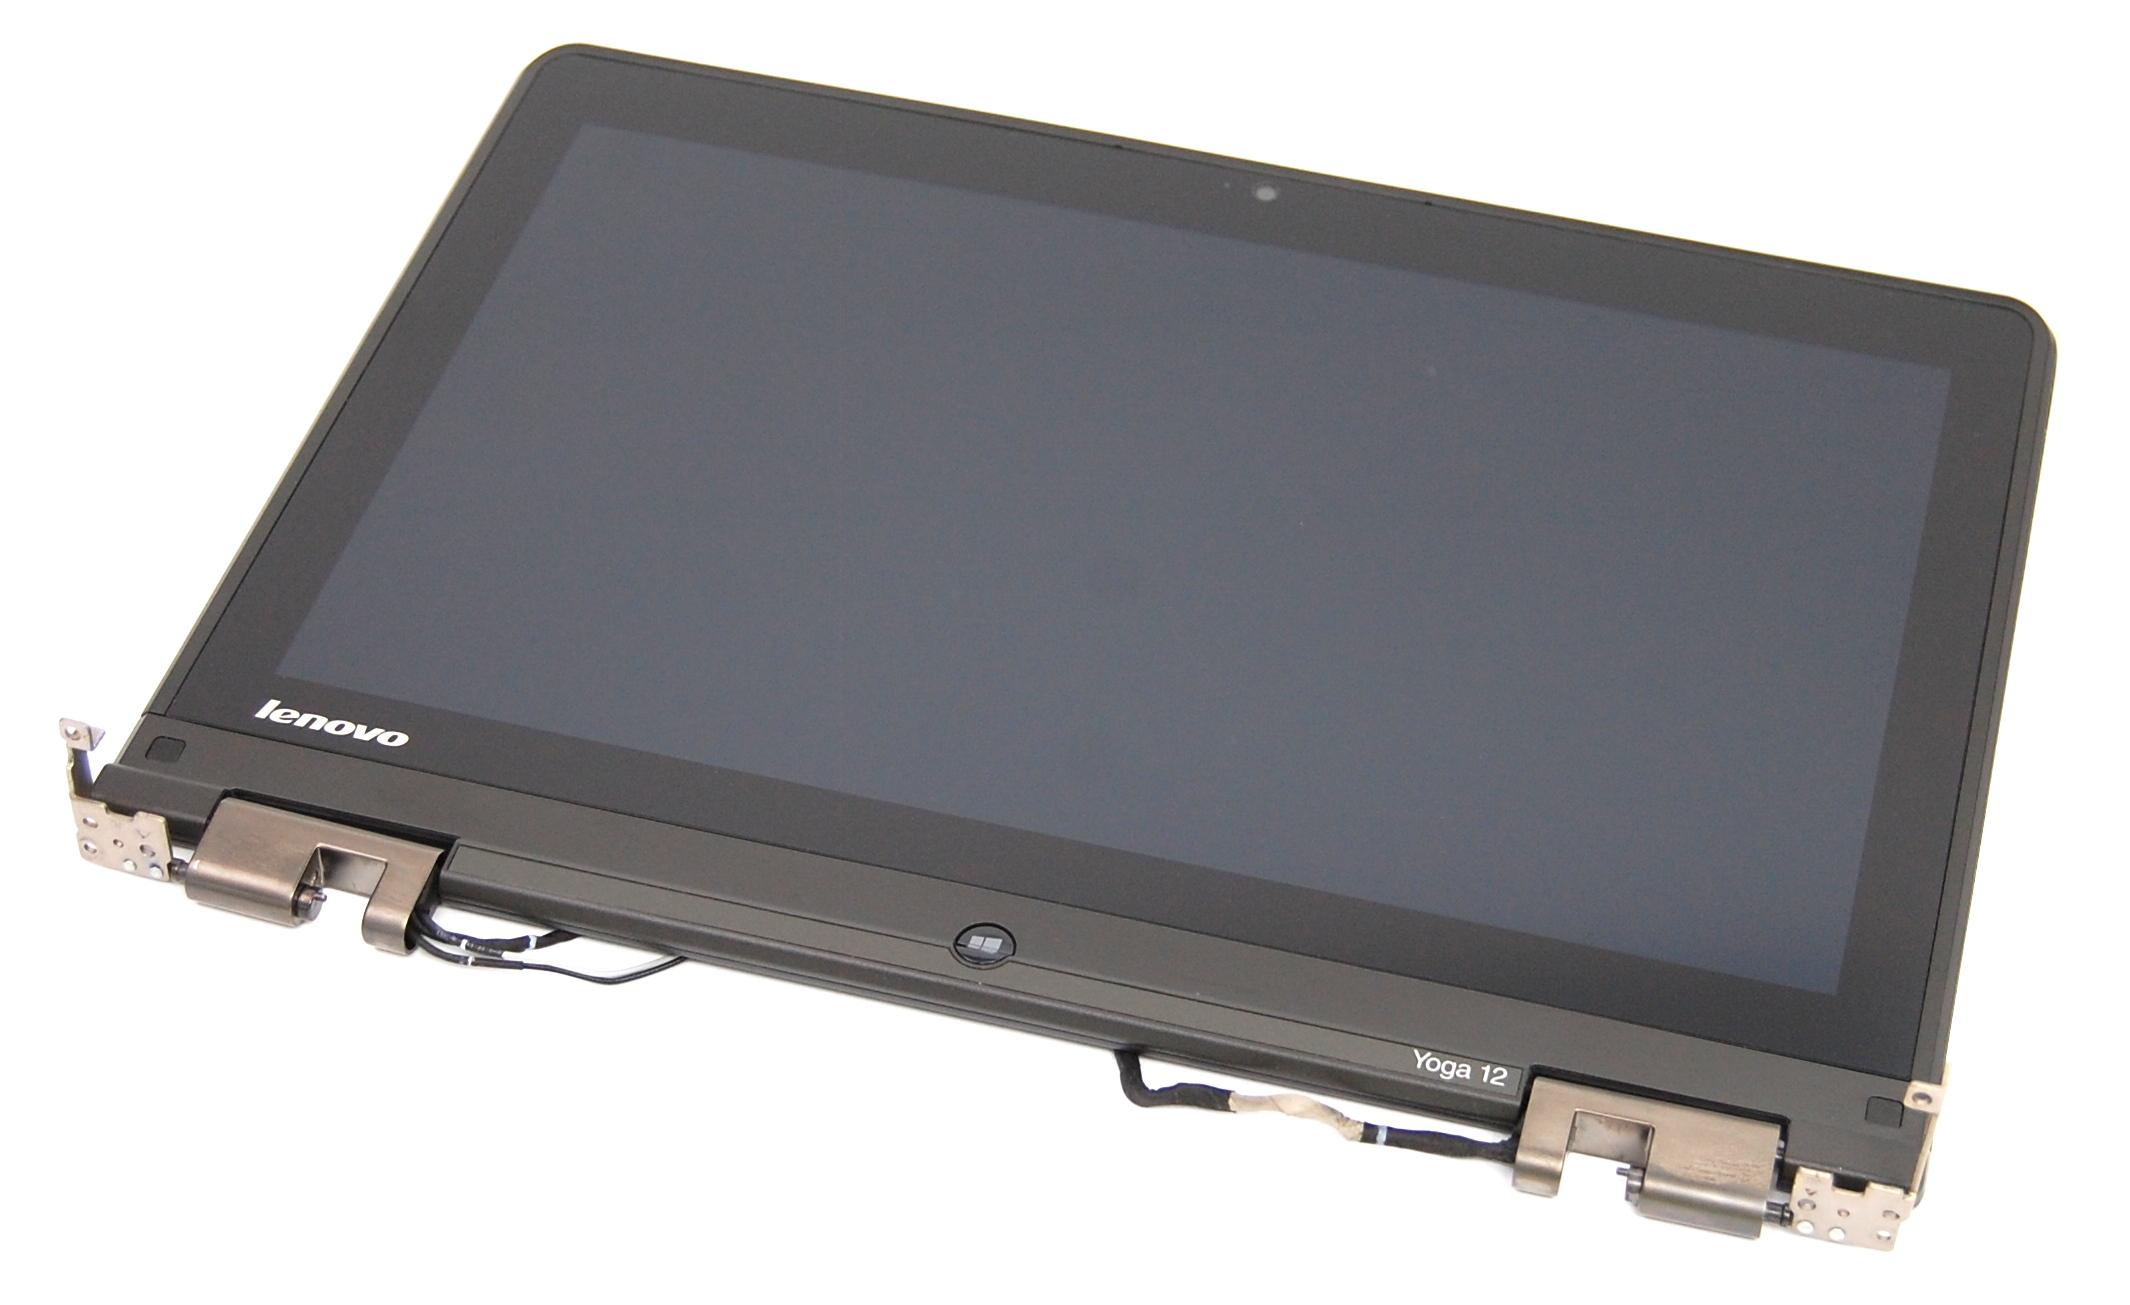 "Lenovo Yoga 12 Touchscreen 12.5"" Convertible Complete Assembly"